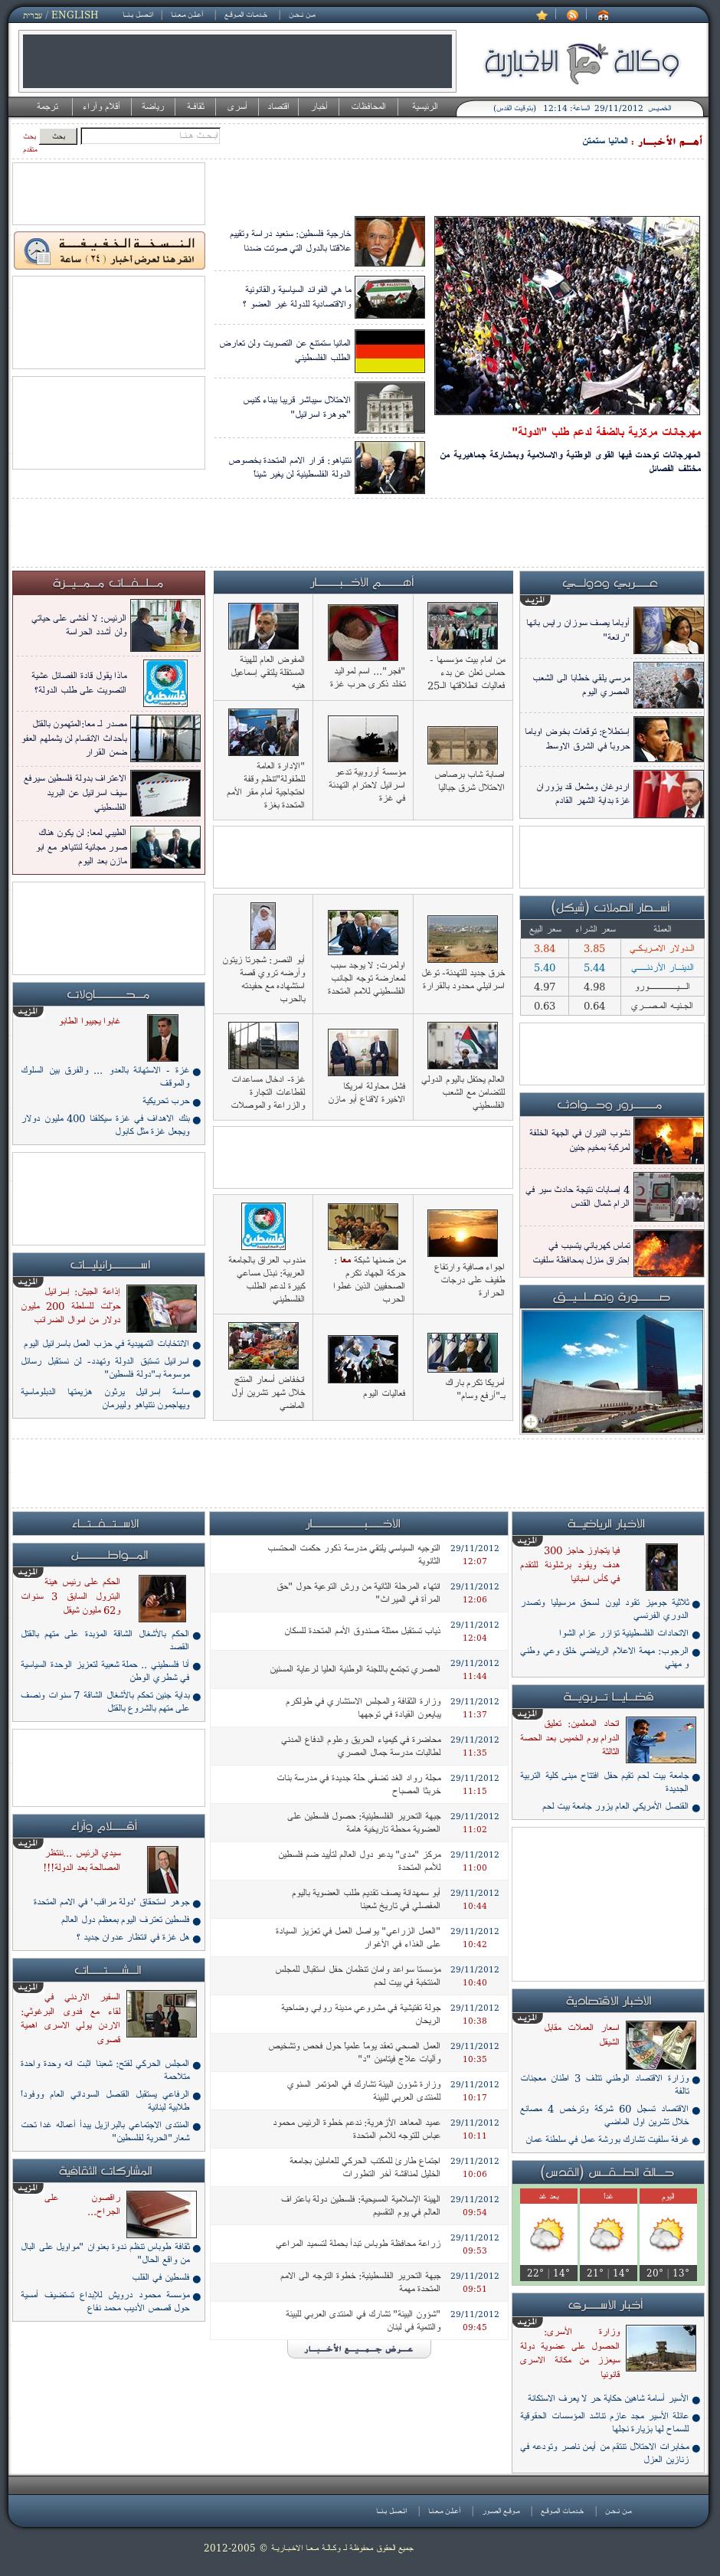 Ma'an News at Thursday Nov. 29, 2012, 10:21 a.m. UTC